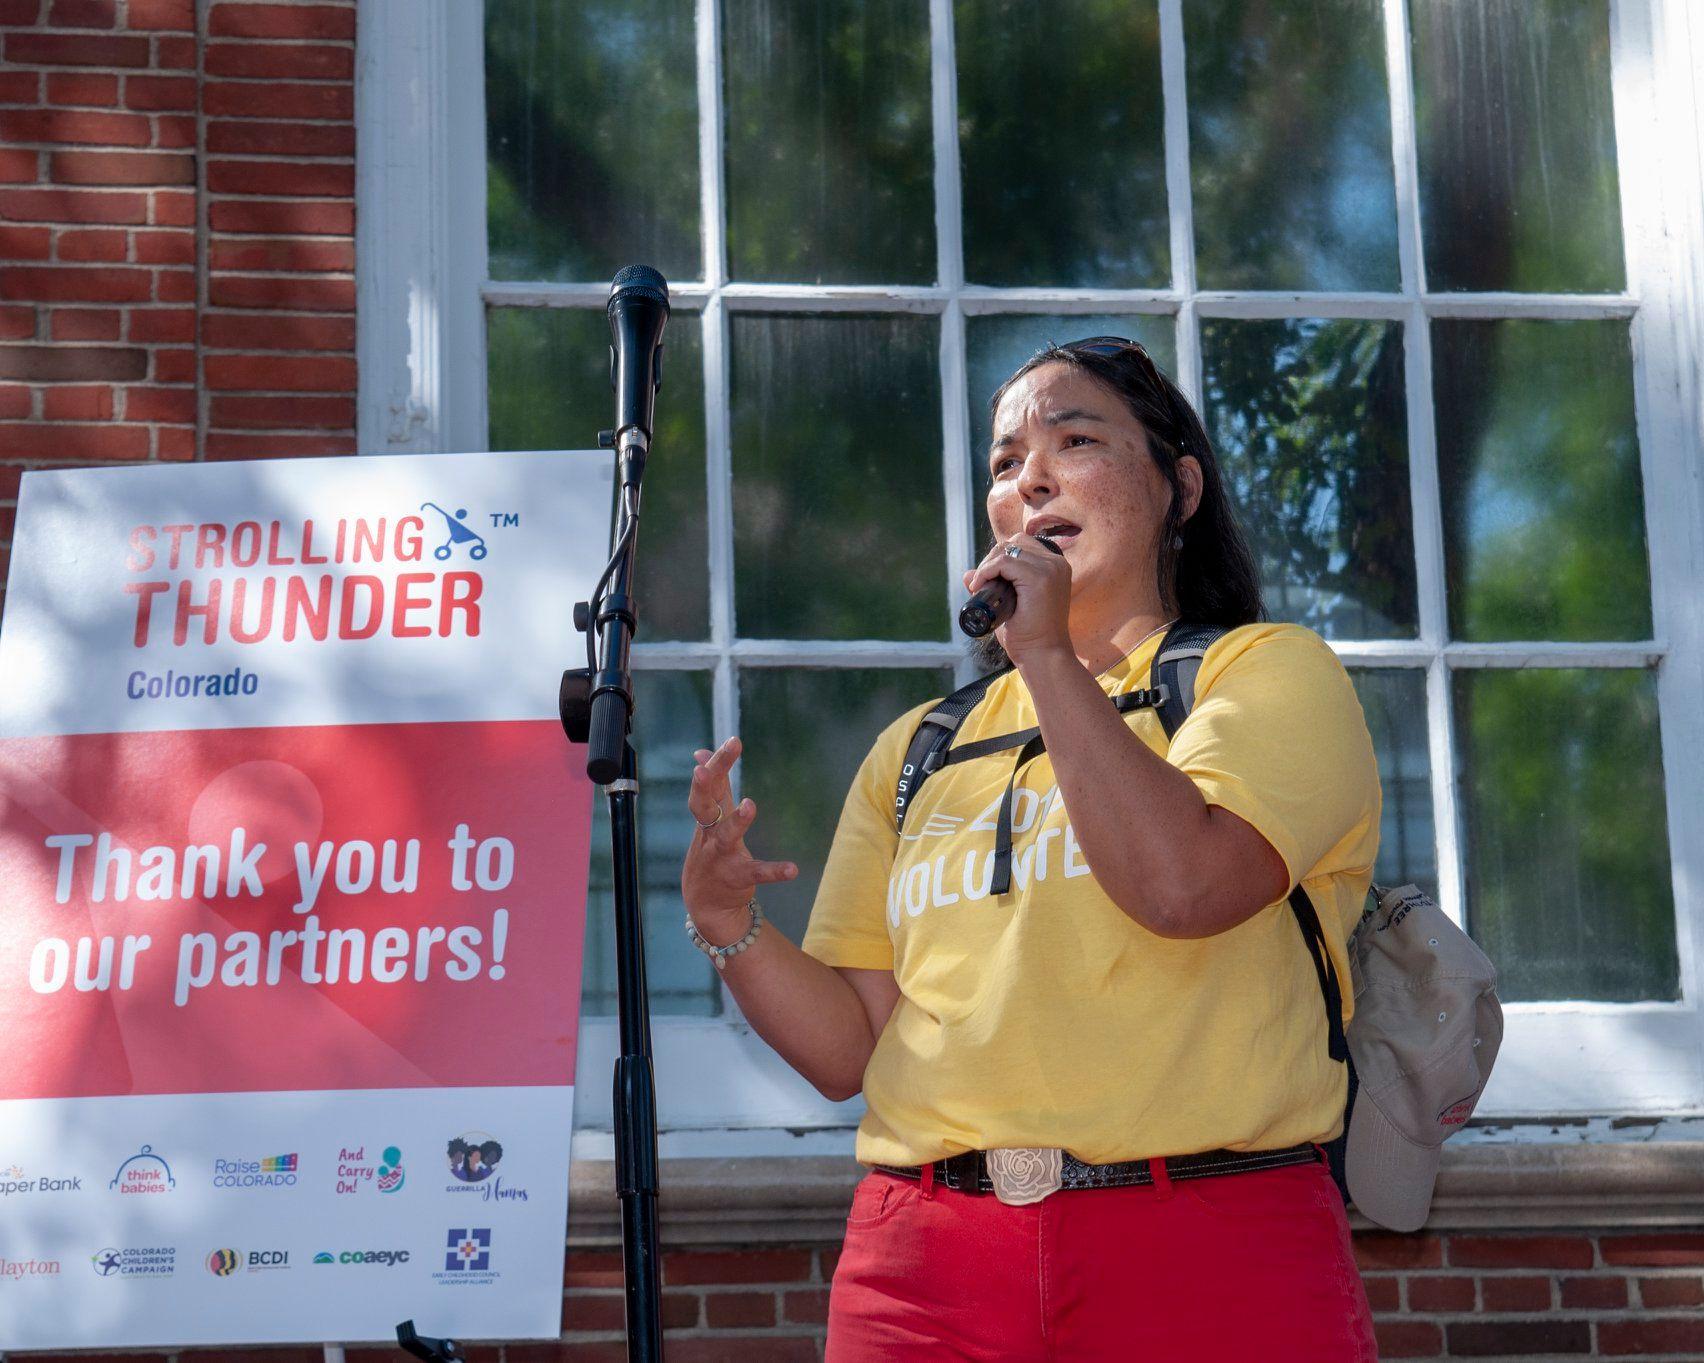 COAEYC Past Chair Akane Orlandella Ogren speaking at Strolling Thunder, September 21st, 2019 photo by Aaron Leavy